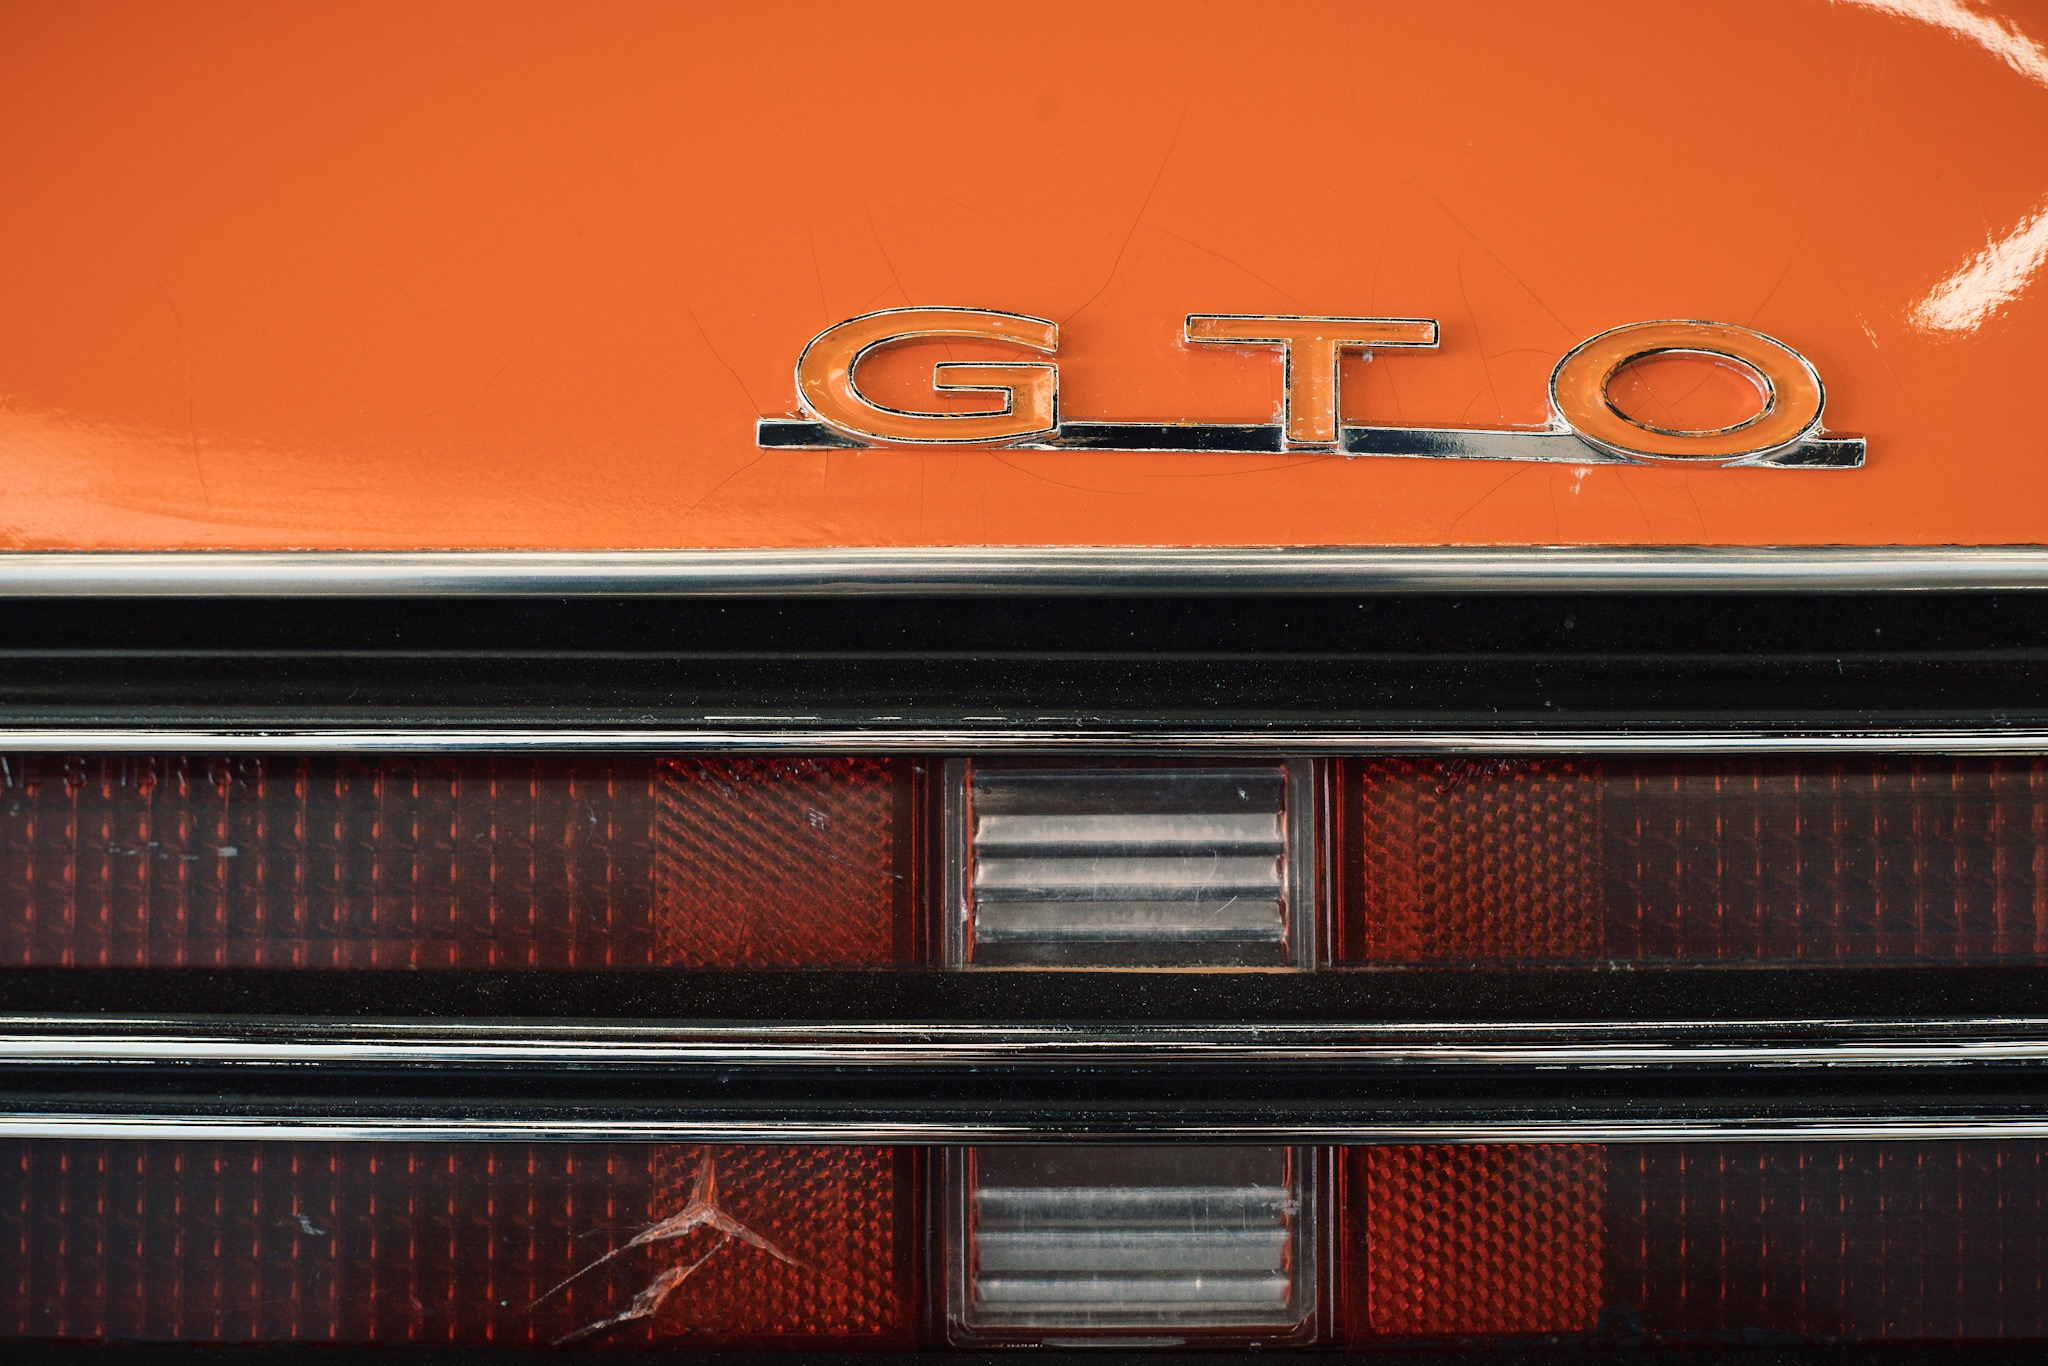 9C490E9B-C6ED-4DFE-90E9-639DEE422DEC.jpeg